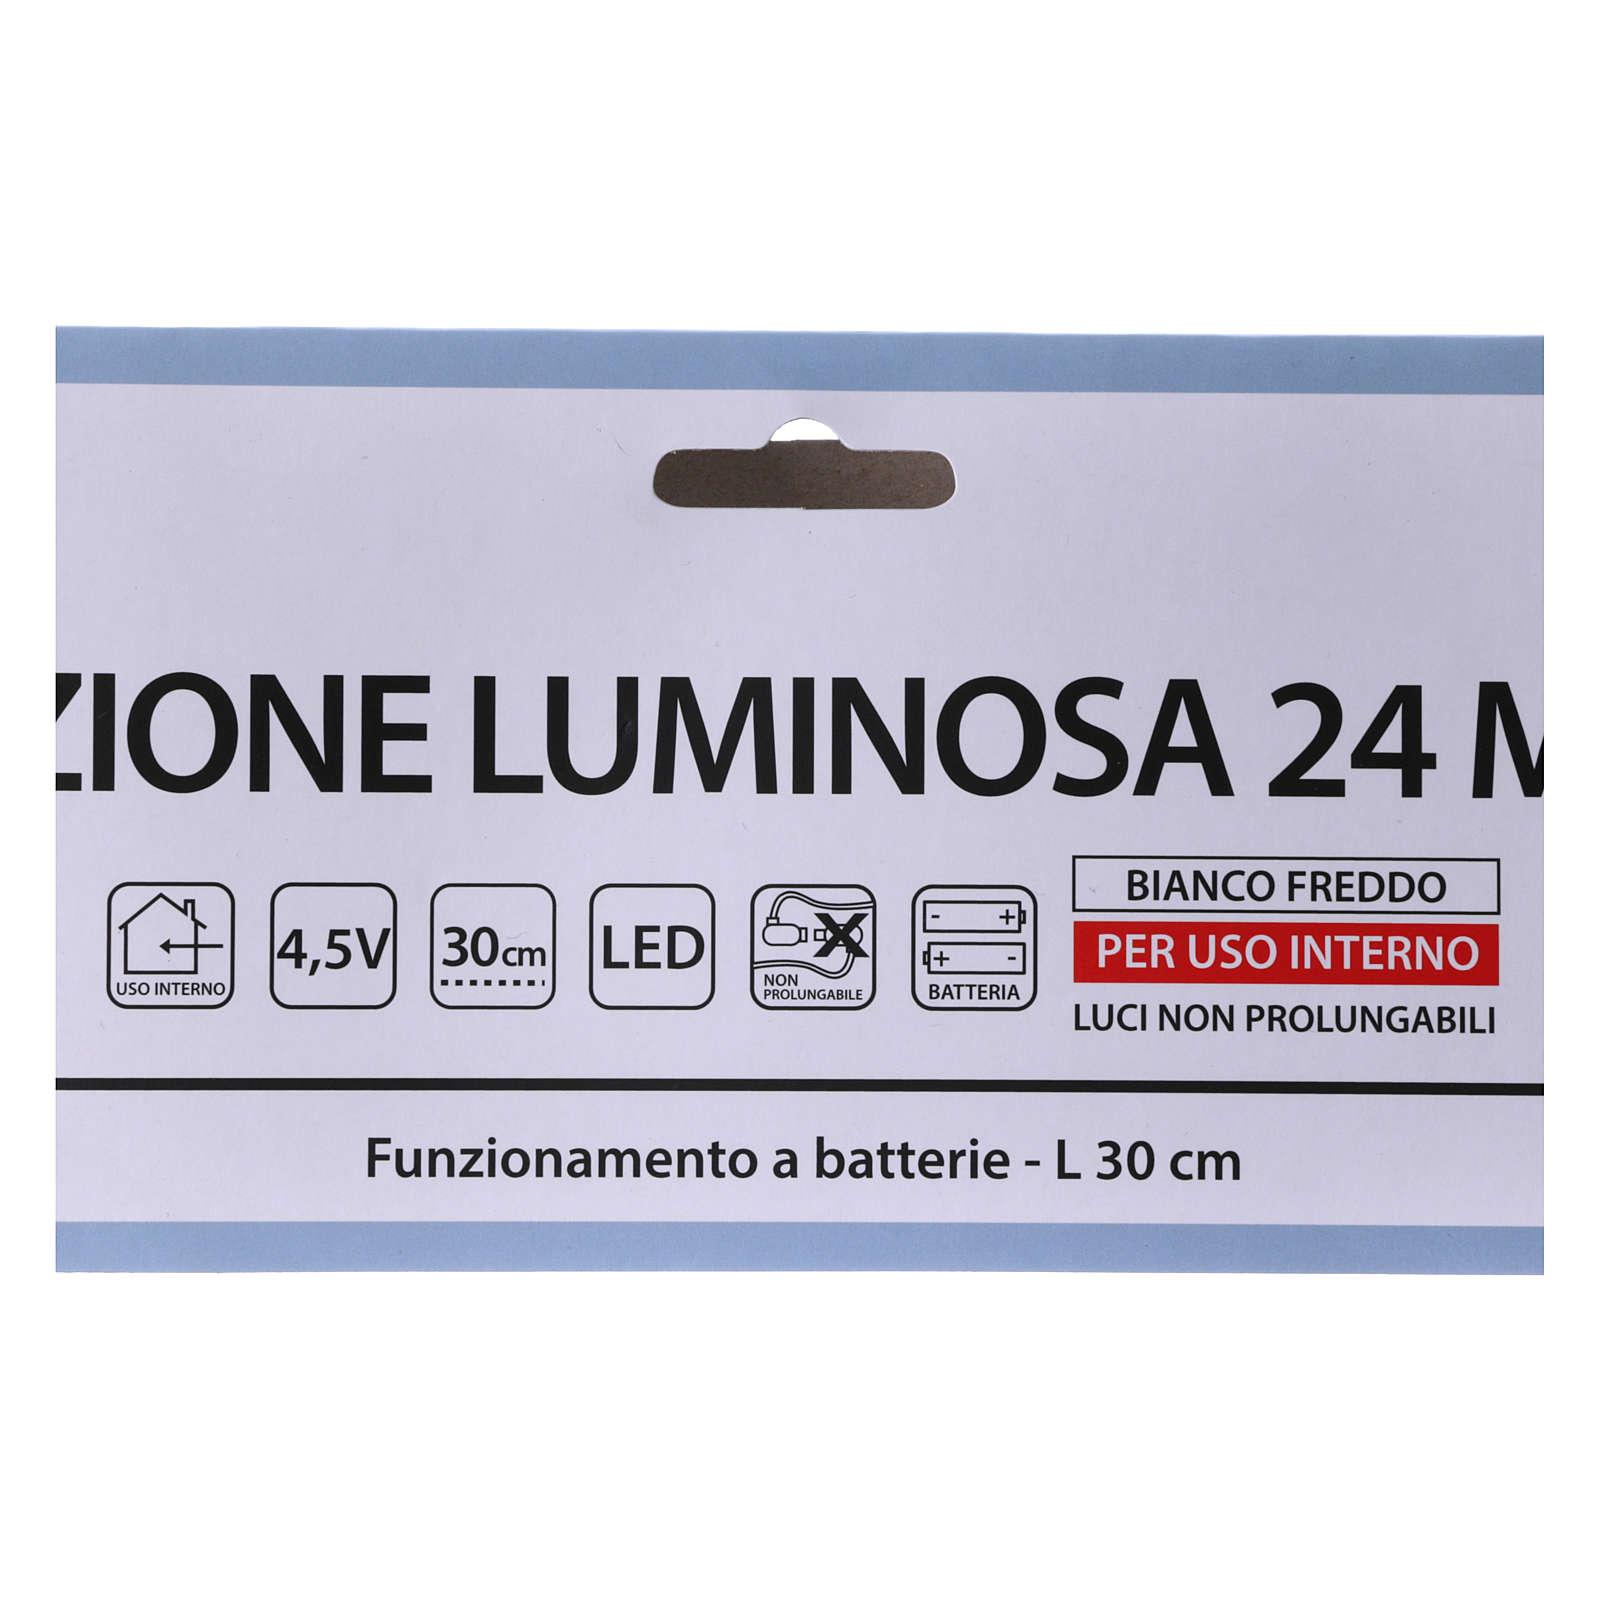 Stella luminosa 24 micro LED bianco freddo INTERNO batteria 3